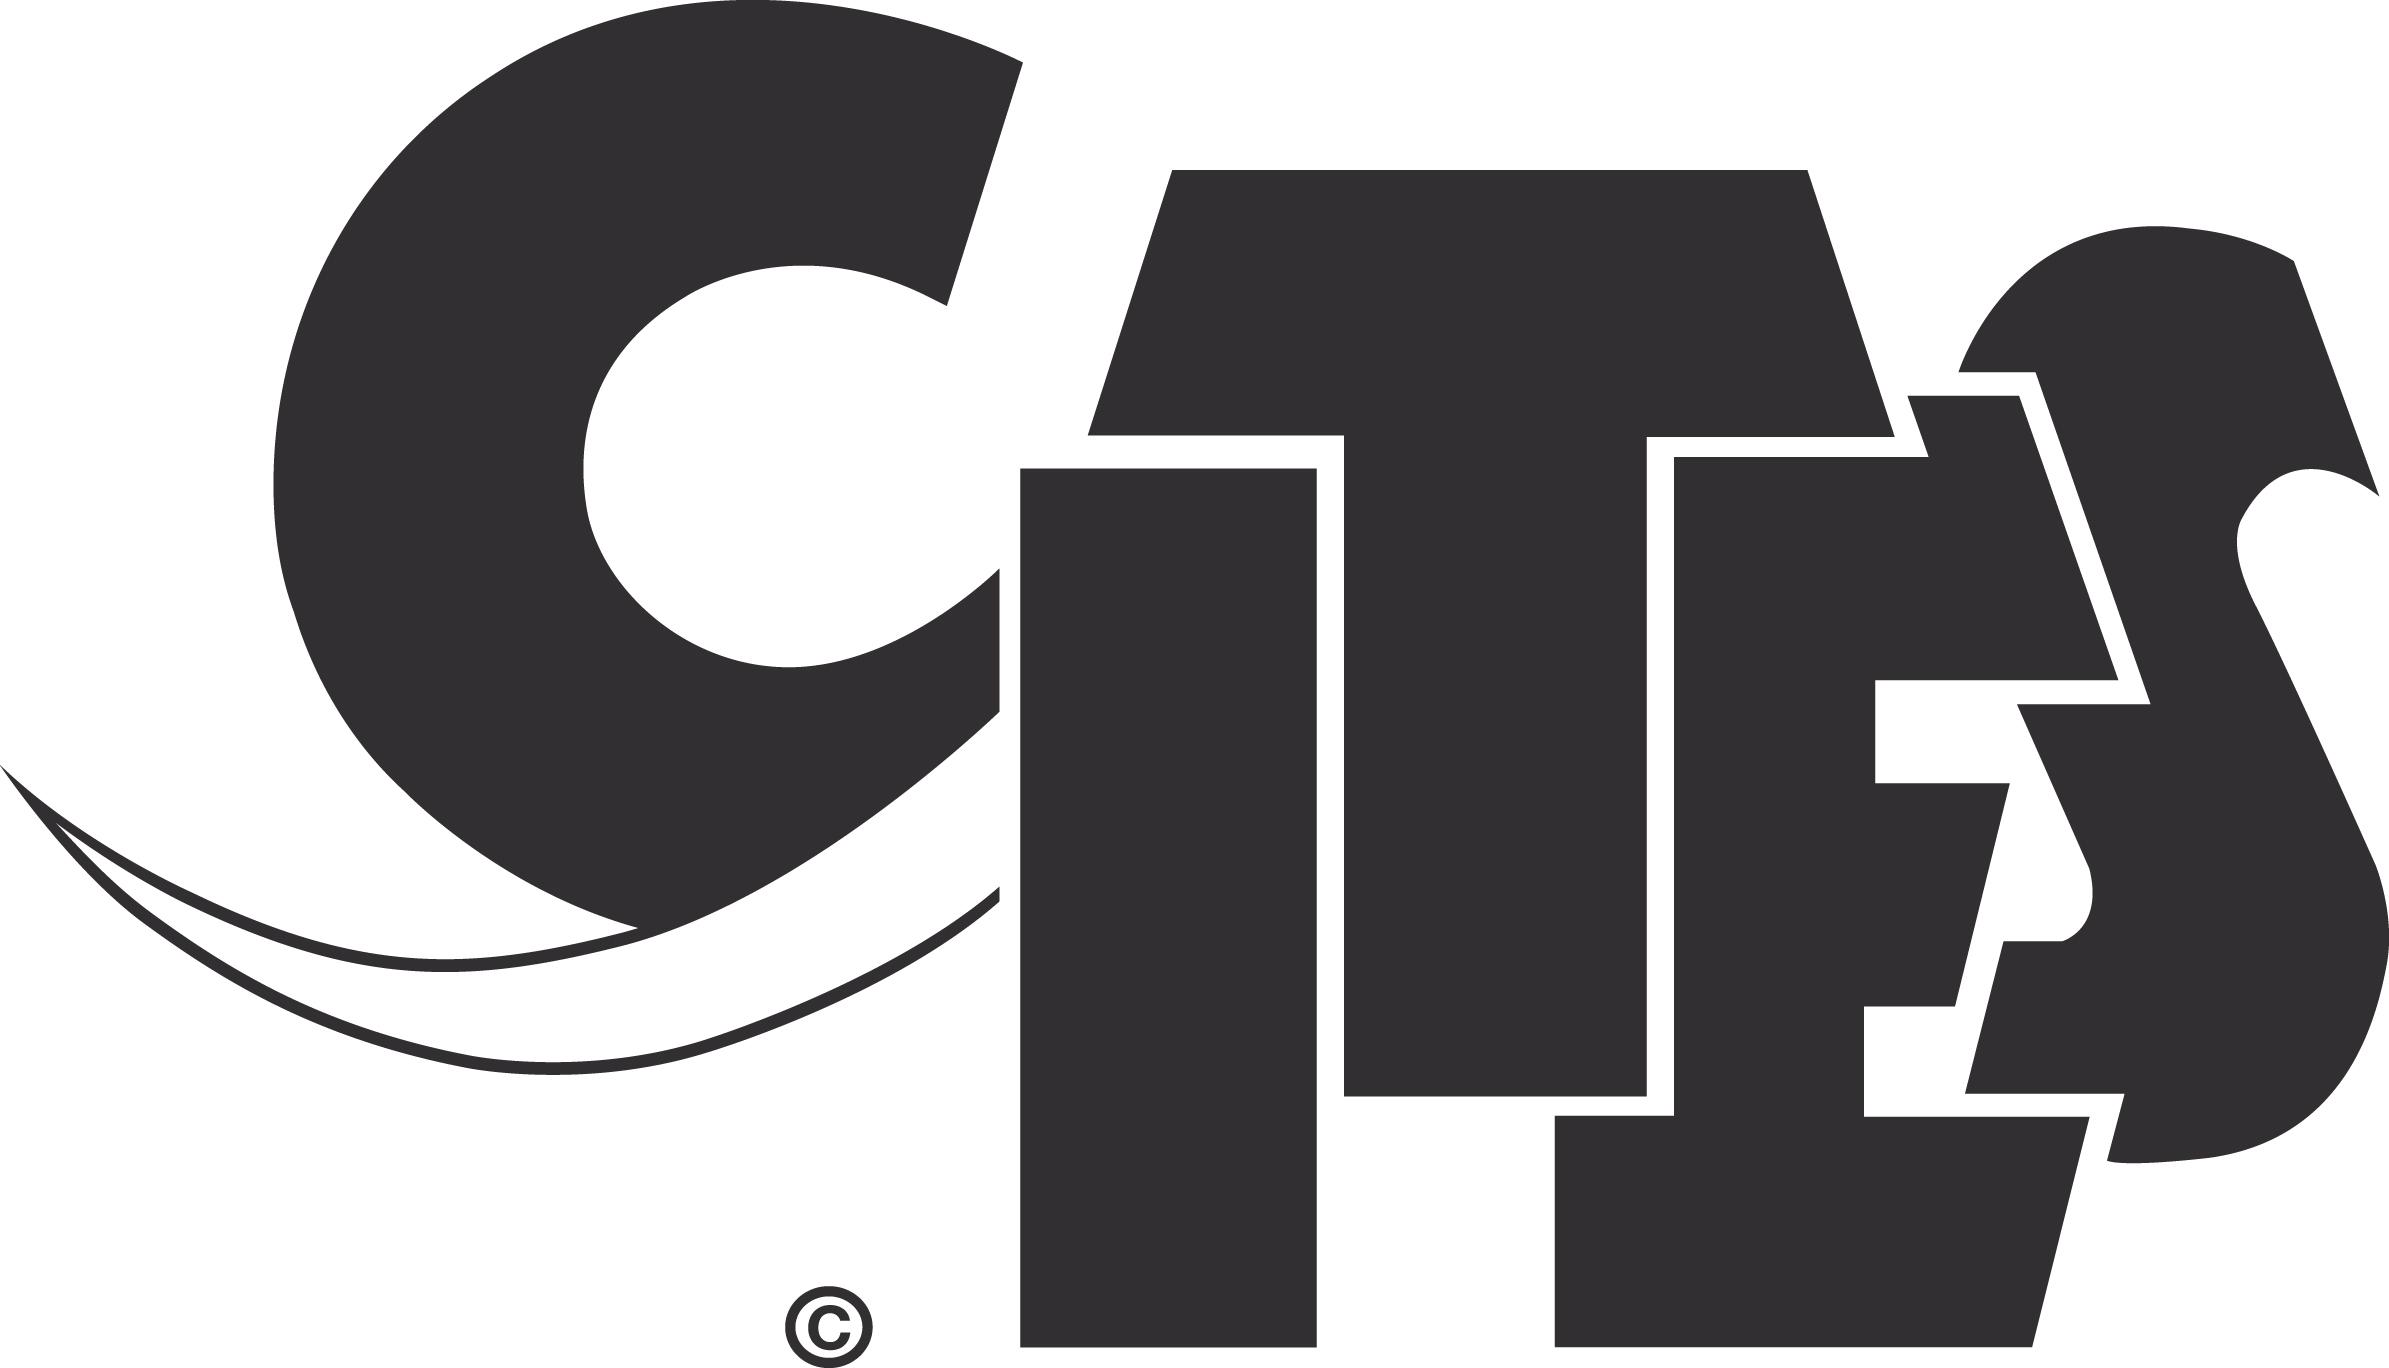 CITES-logo-high-resolution.jpg